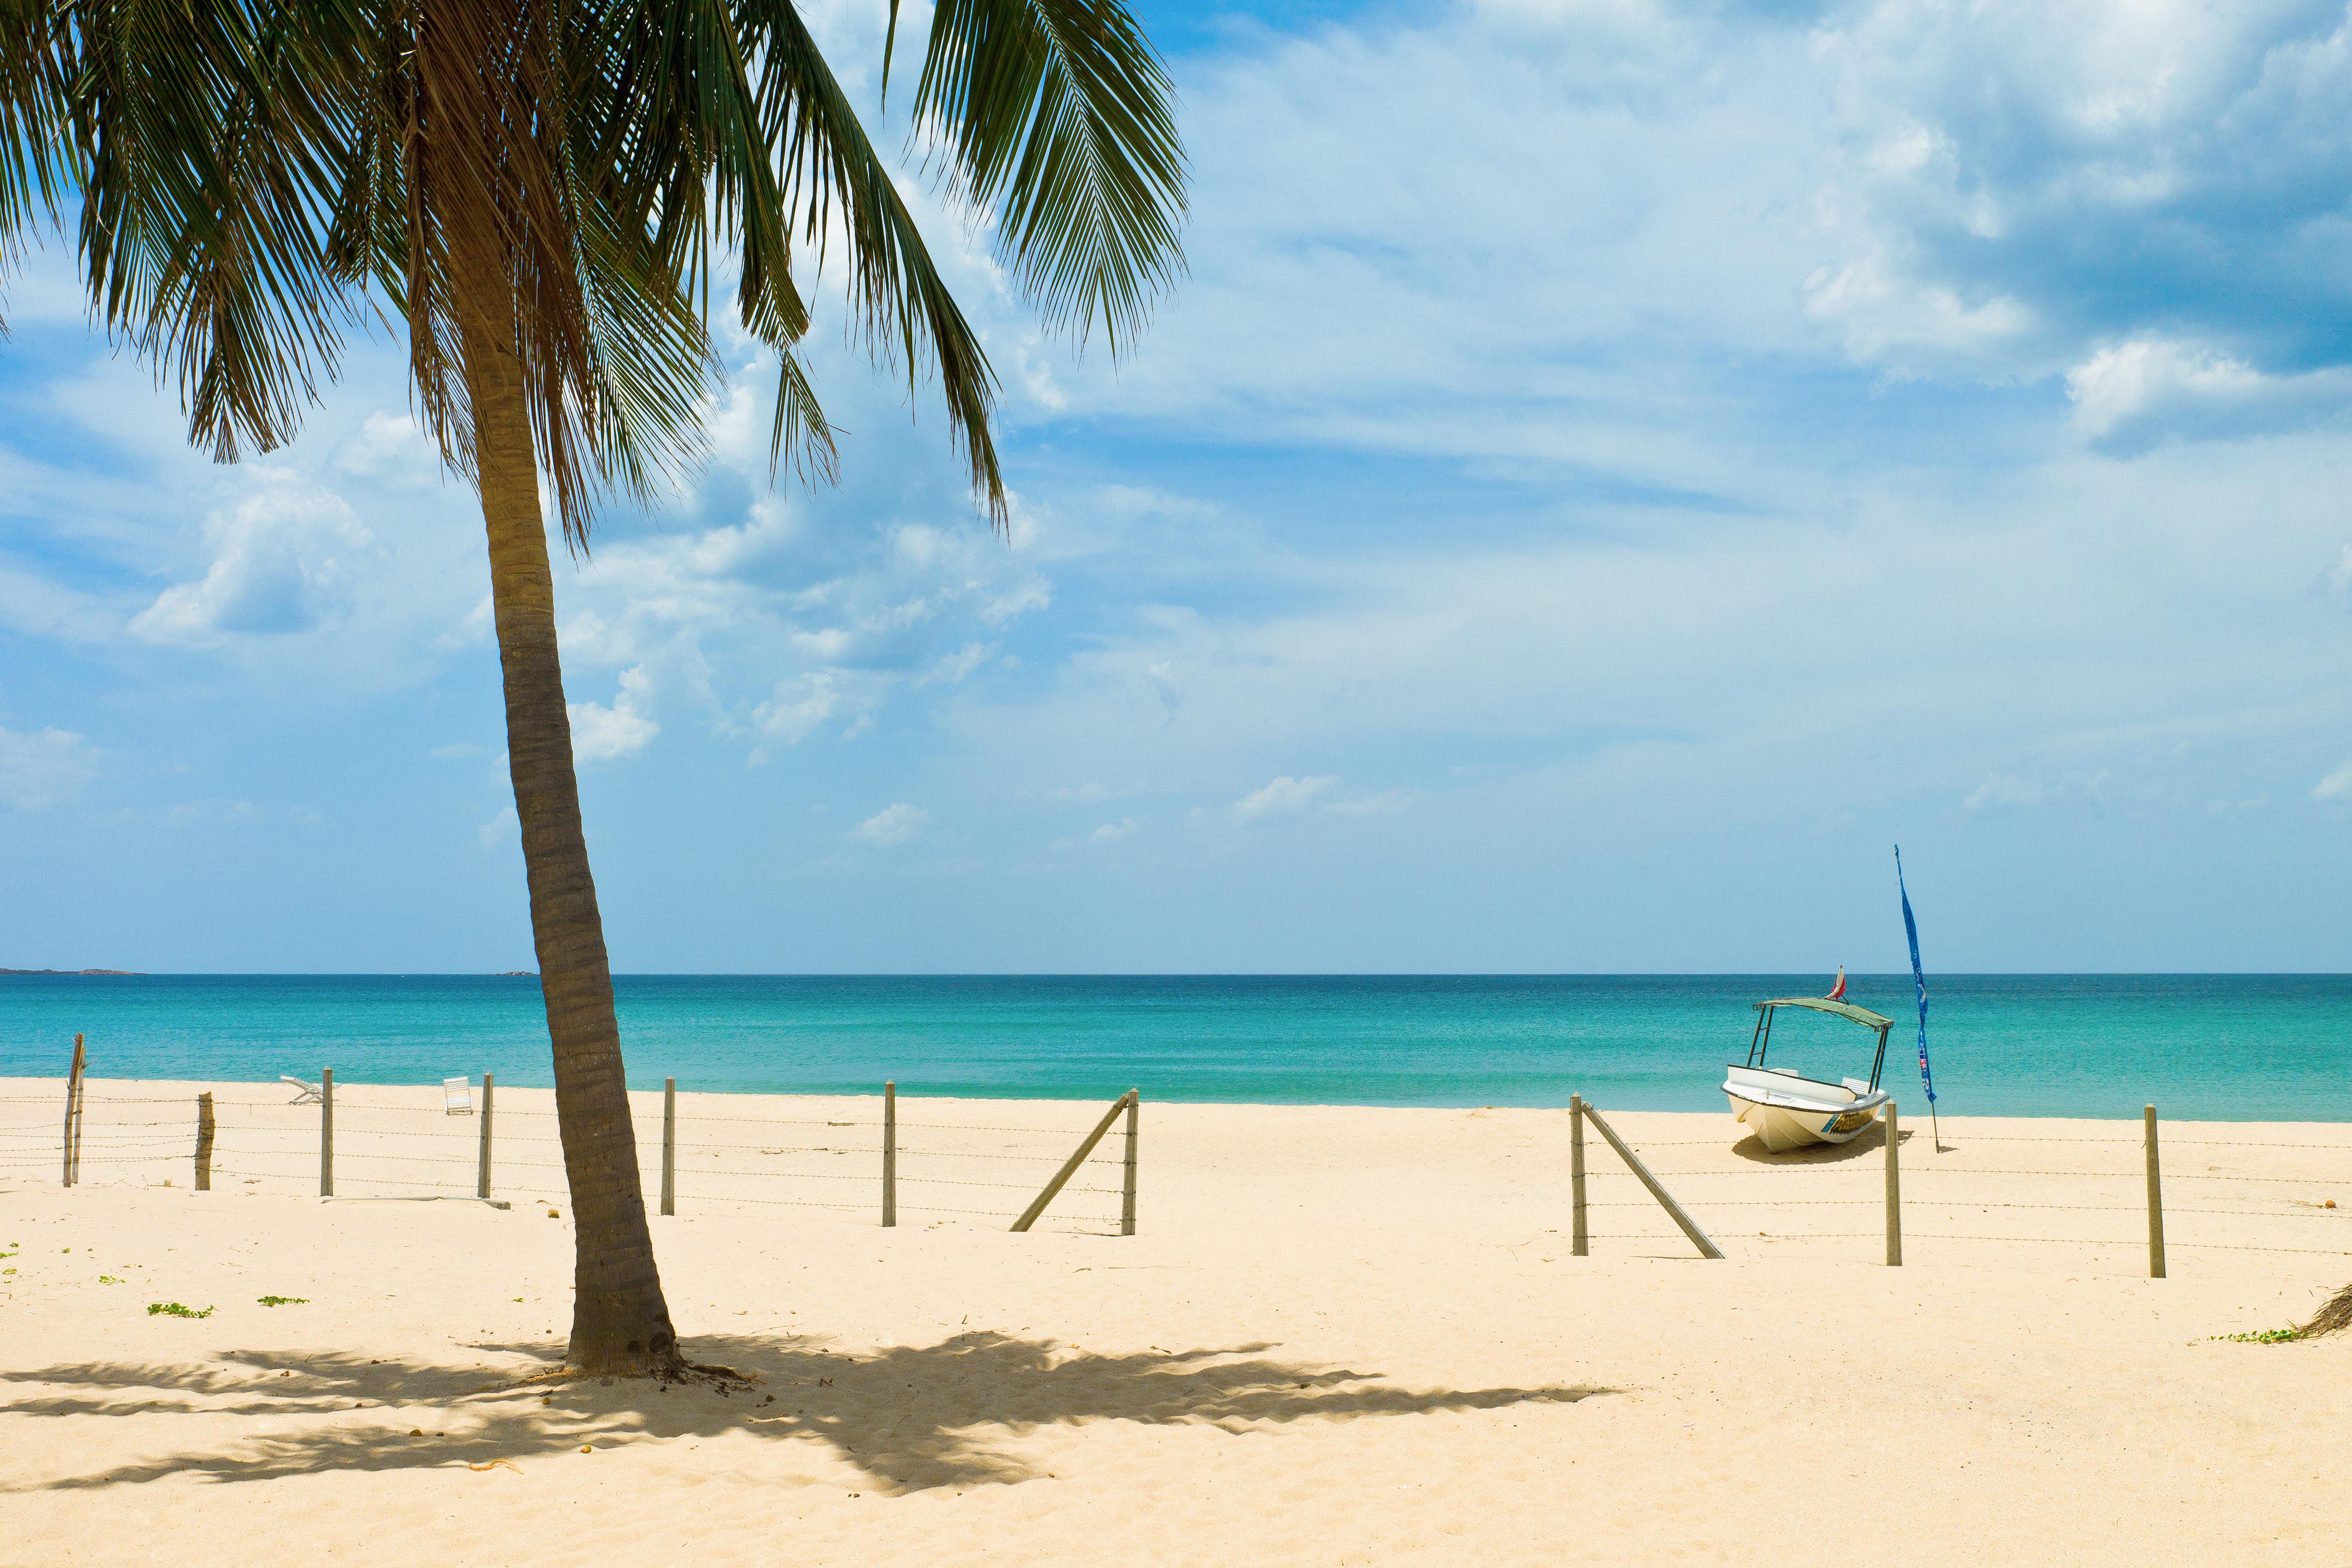 White sandy beach at Trincomalee